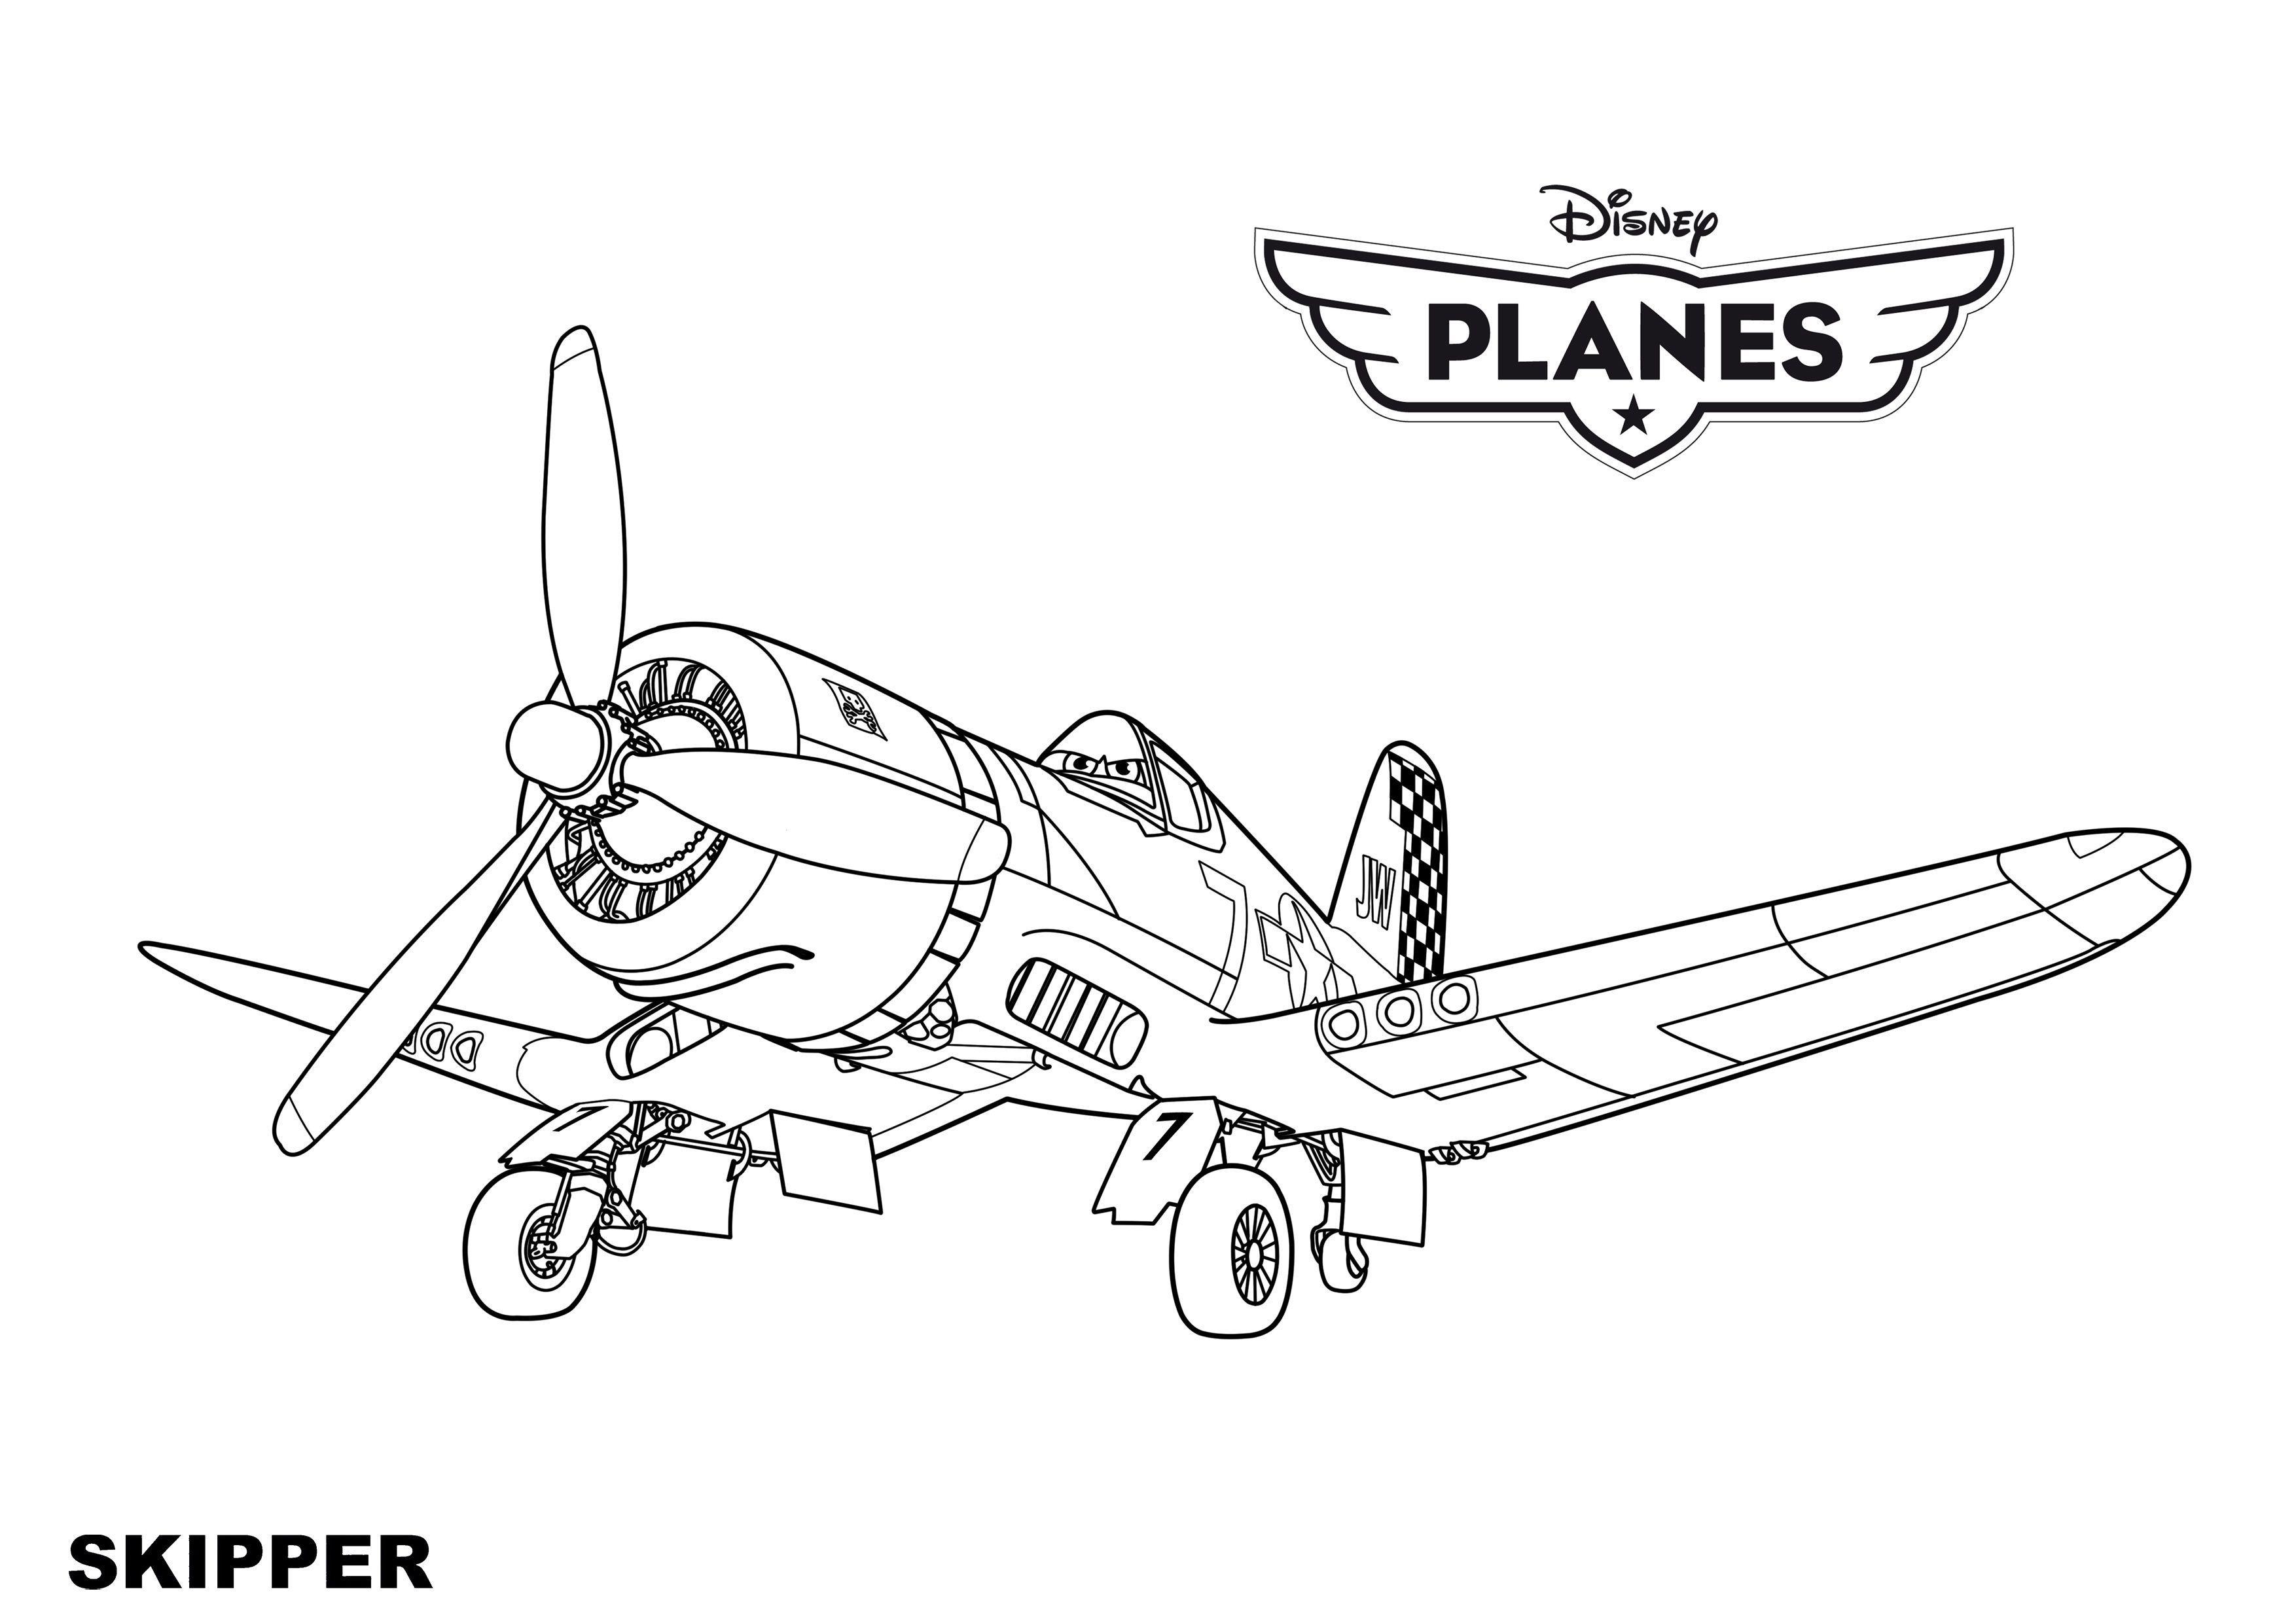 Google Image Result For Https I Pinimg Com Originals B9 F7 1b B9f71b6b16b538273c8856cdc Airplane Coloring Pages Disney Coloring Pages Coloring Pages For Boys